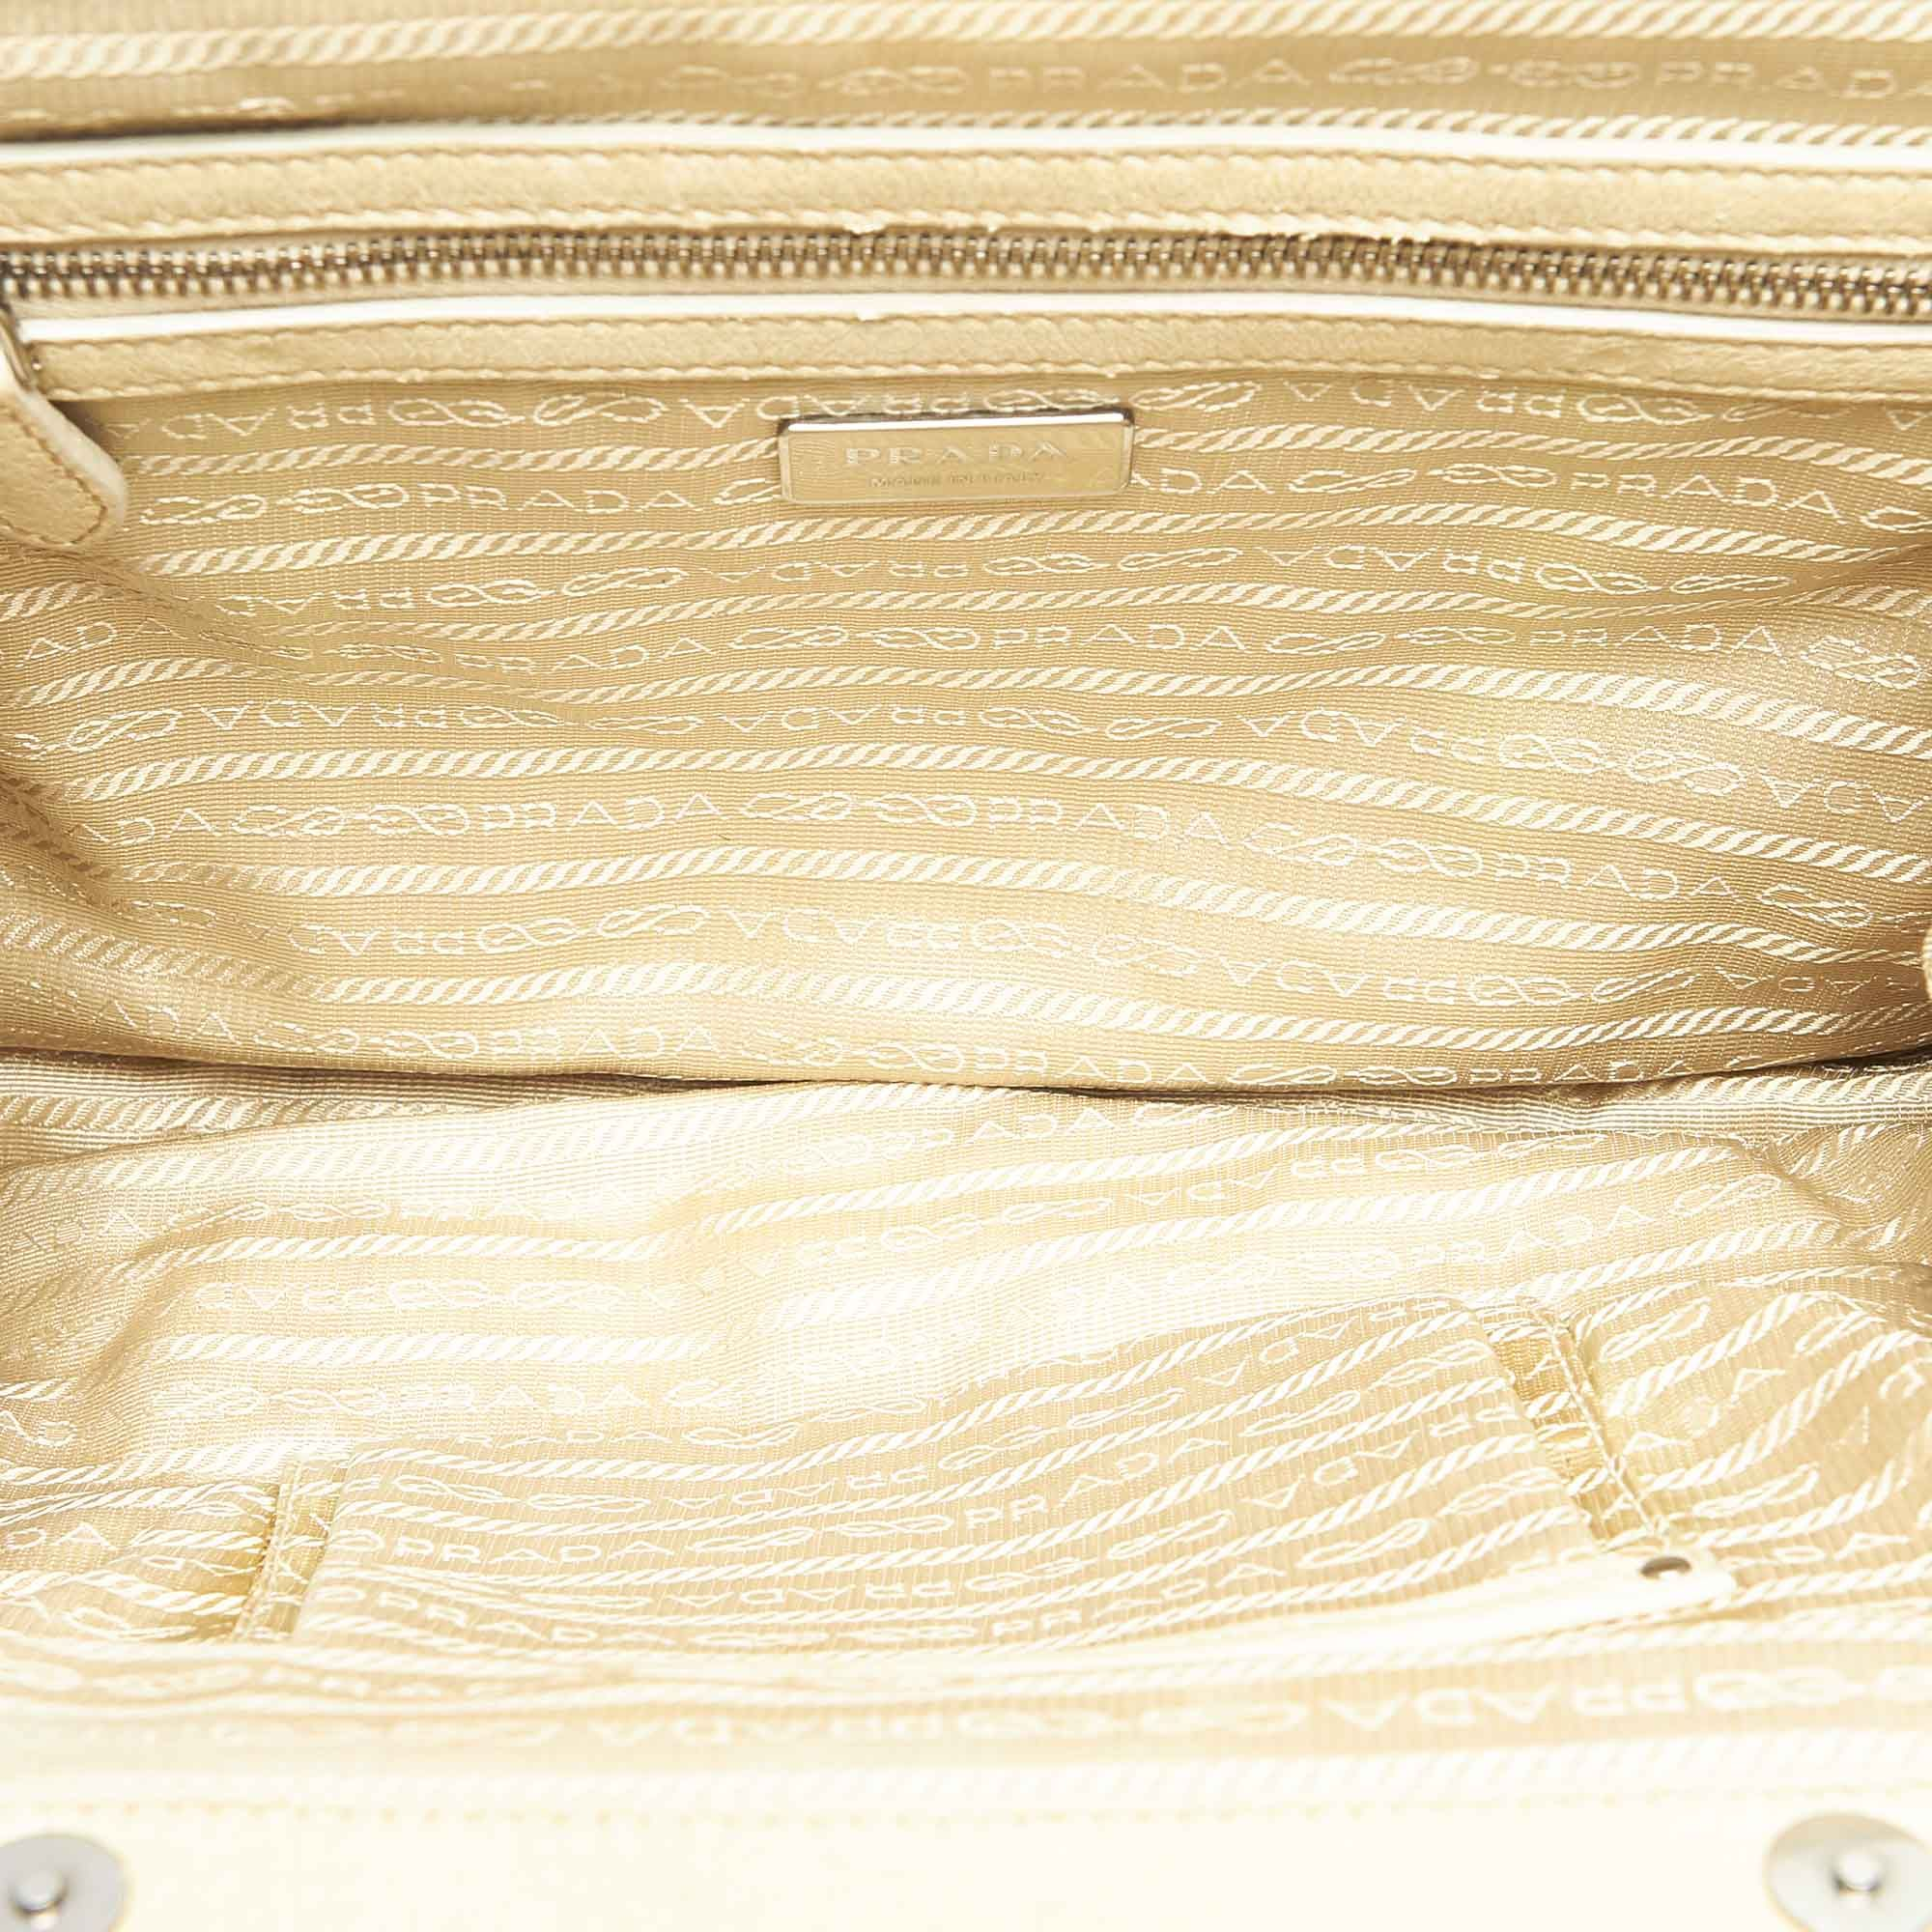 Vintage Prada Tessuto Gaufre Frame Shoulder Bag White